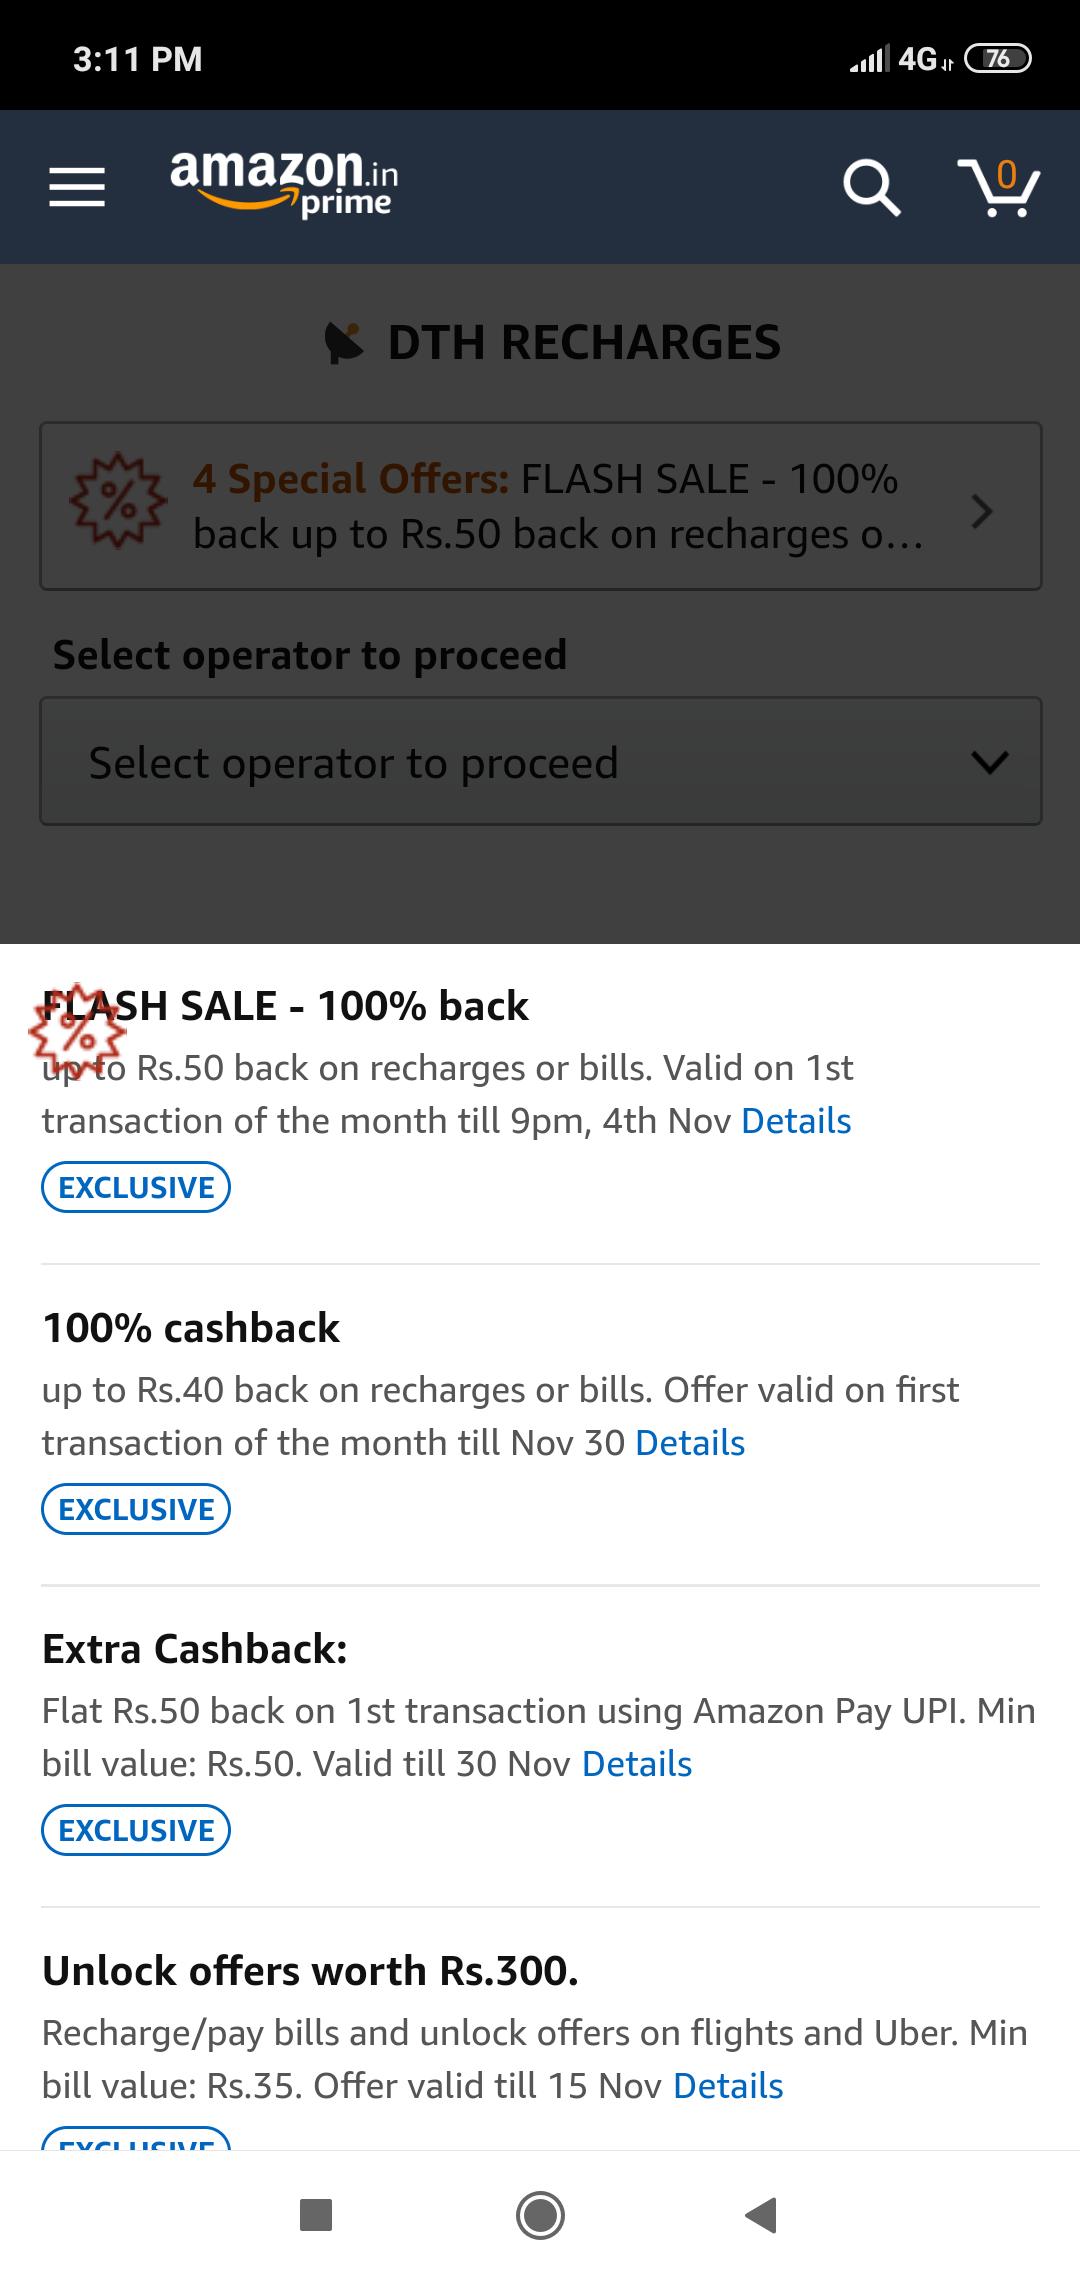 https://cdn0.desidime.com/attachments/photos/593704/original/Screenshot_2019-11-04-15-11-47-173_in.amazon.mShop.android.shopping.png?1572860578